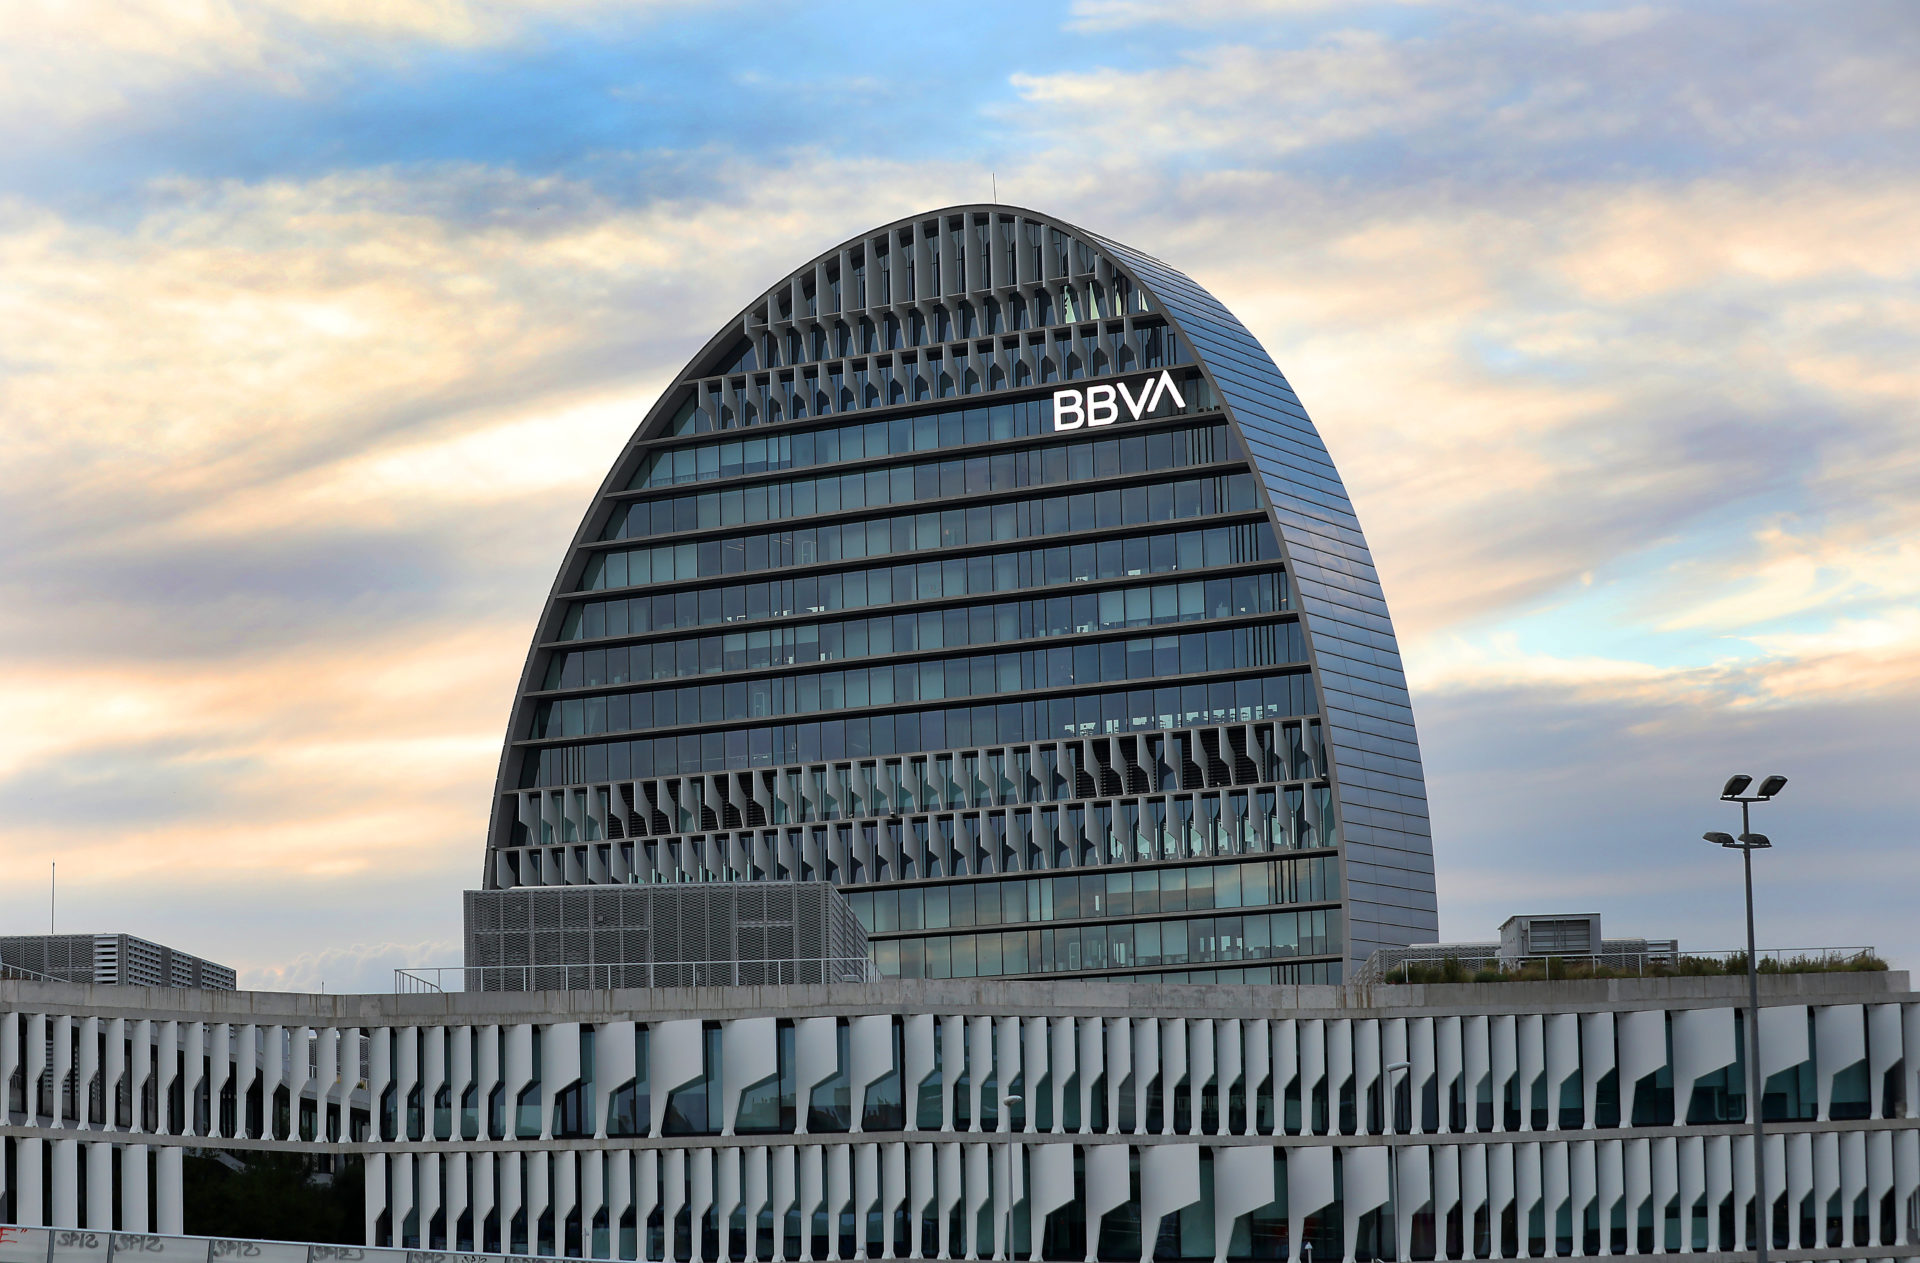 https://shareholdersandinvestors.bbva.com/wp-content/uploads/2019/11/ciudad-vela-nuevo-logo-bbva-1920x1263.jpg